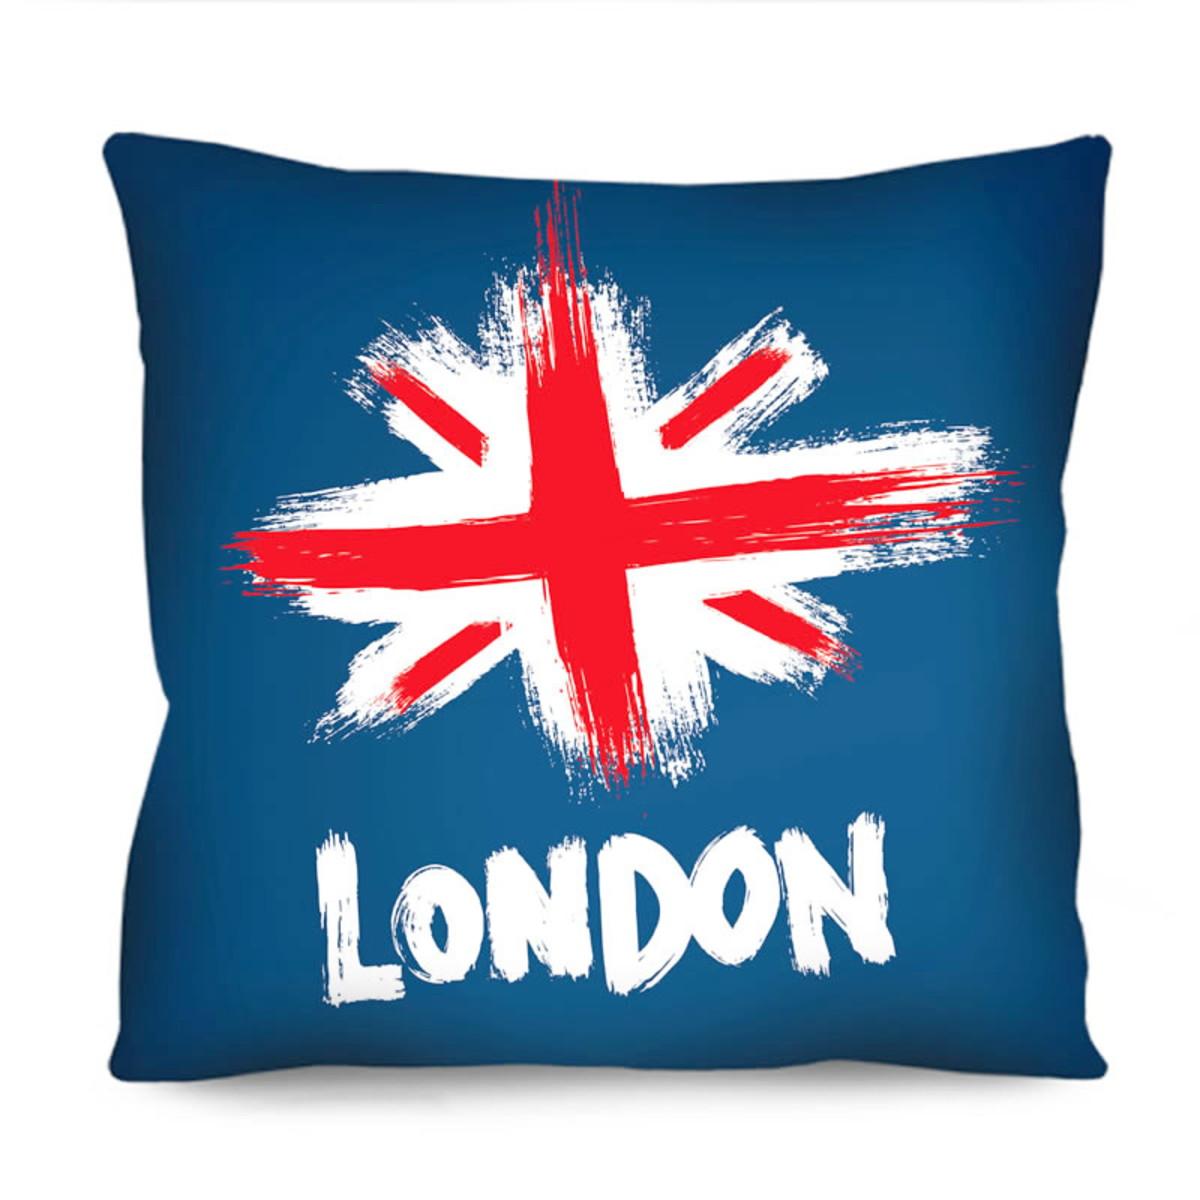 Almofada Decorativa Londres Inglaterra Bandeira 42x42 Rcd01 no Elo7 ... 48dccec7f5c36